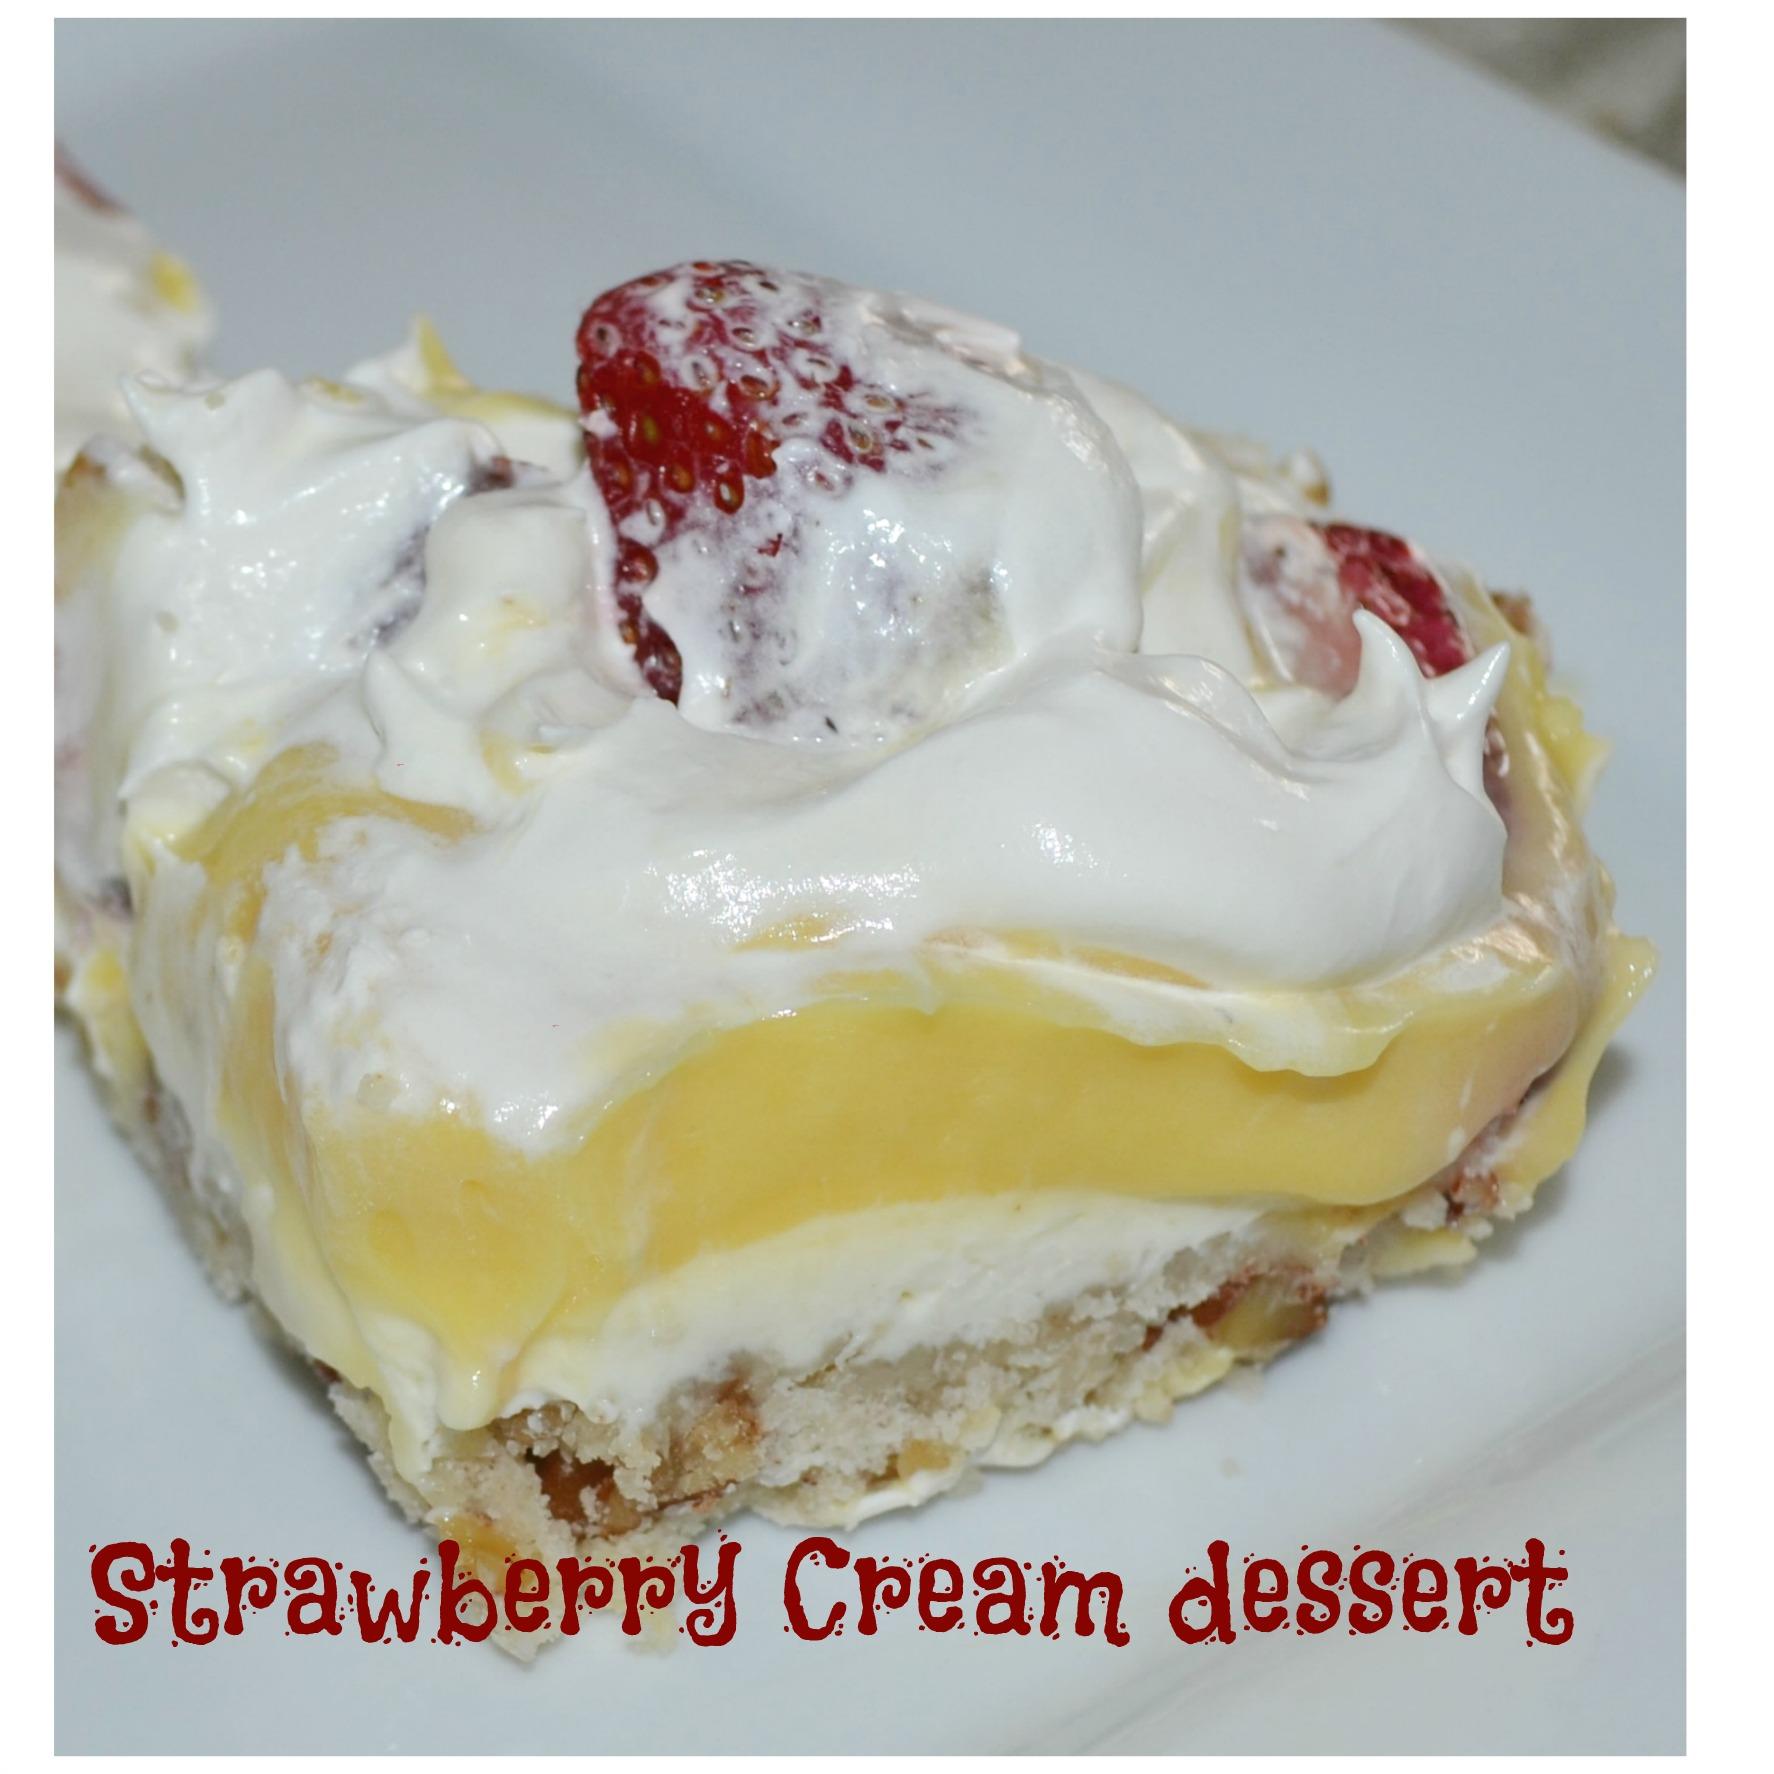 starwberry cream dessert, kids cooking class, pudding,